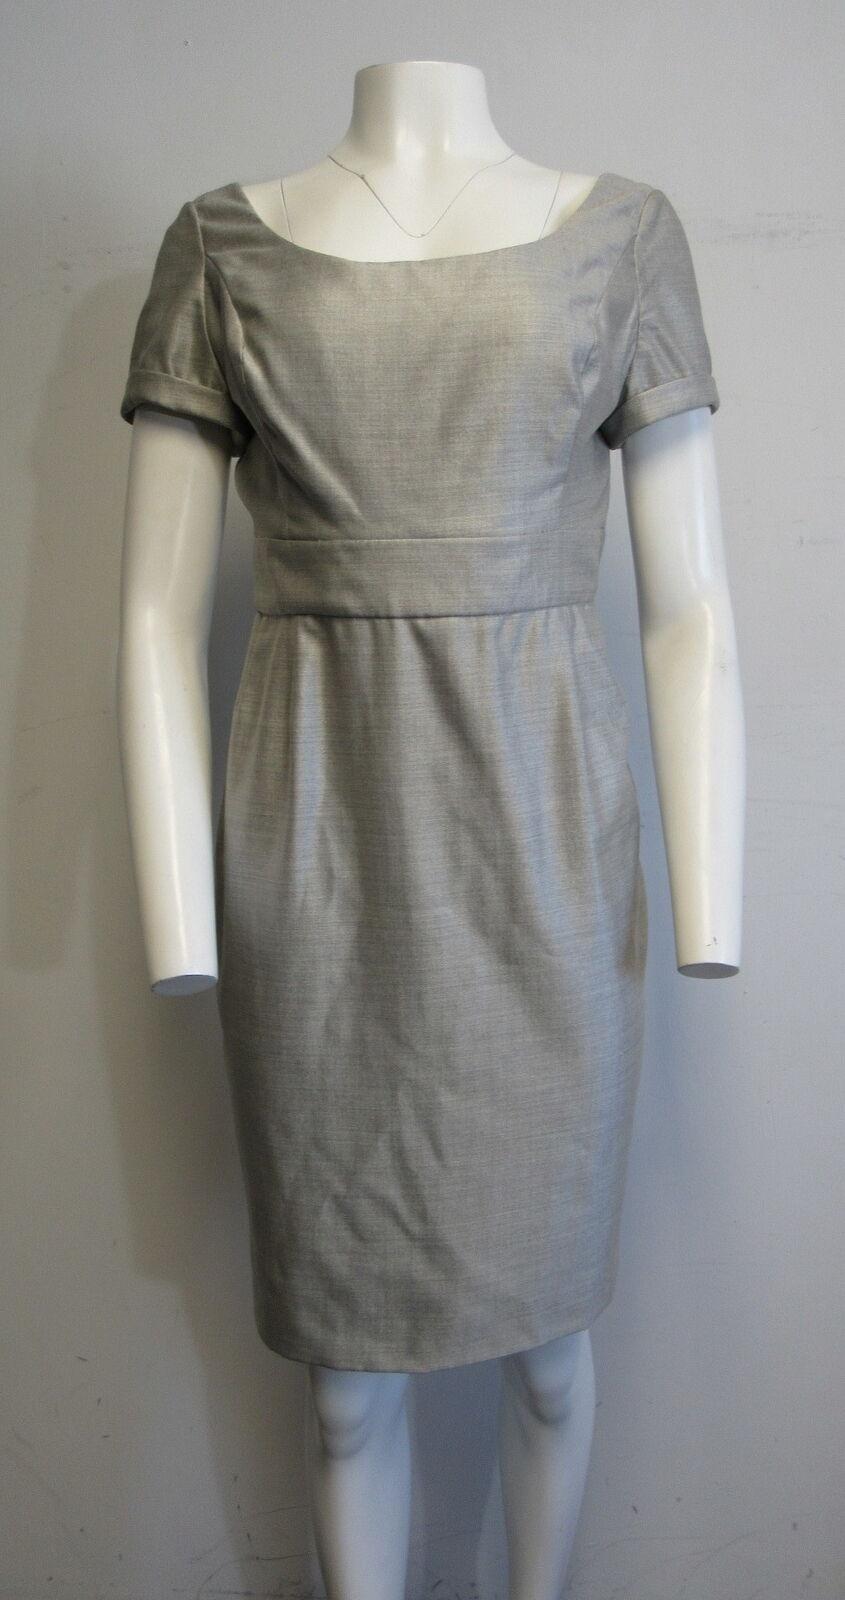 BILL BLASS heatherot grau short-sleeve scoop-neck straight cut dress sz 8